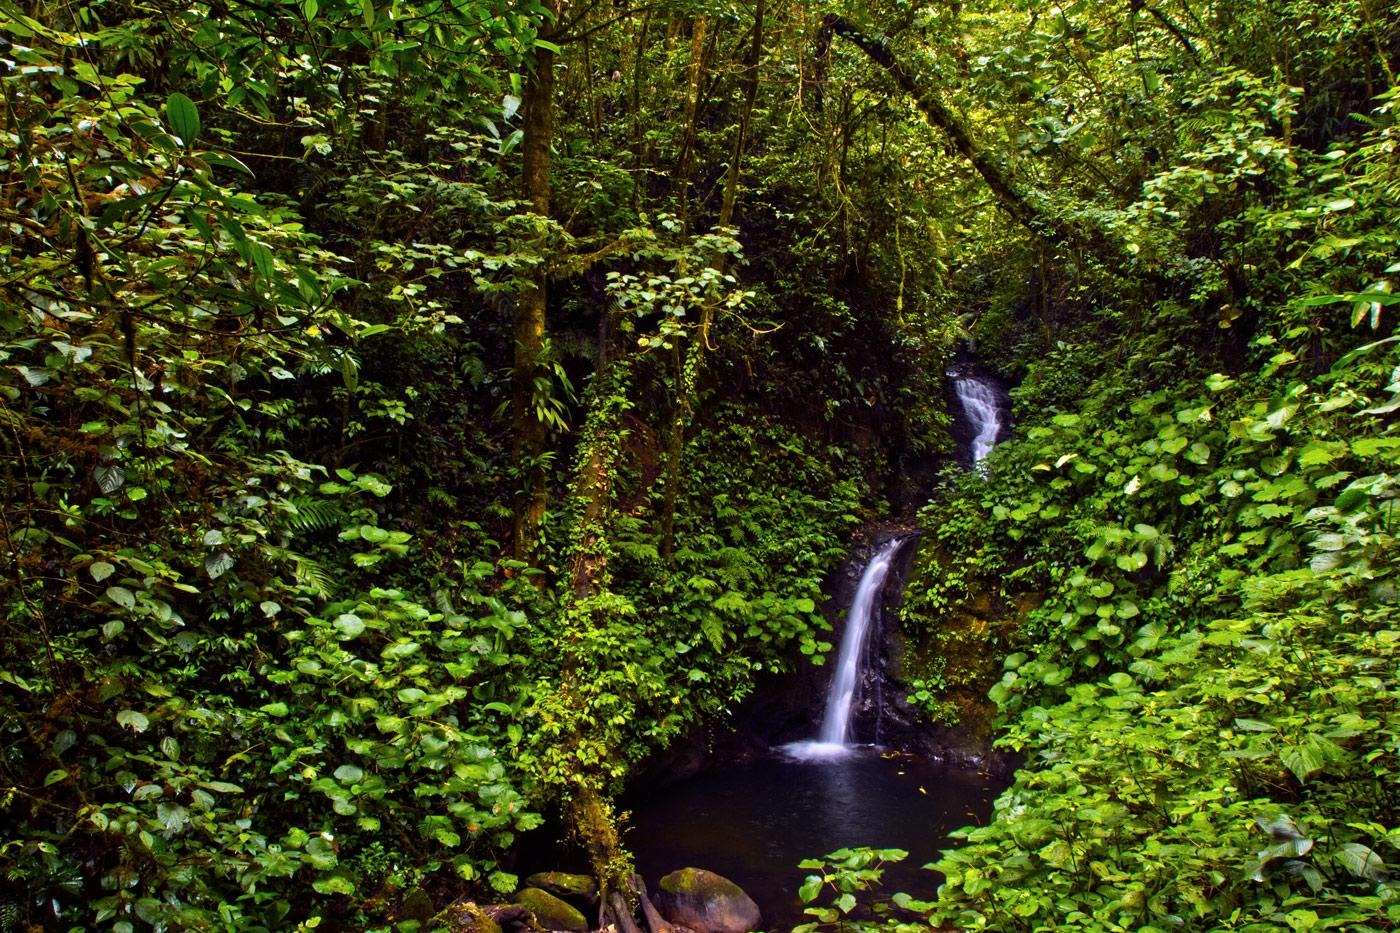 Nick-Zantop-Photography-Rainforest-6